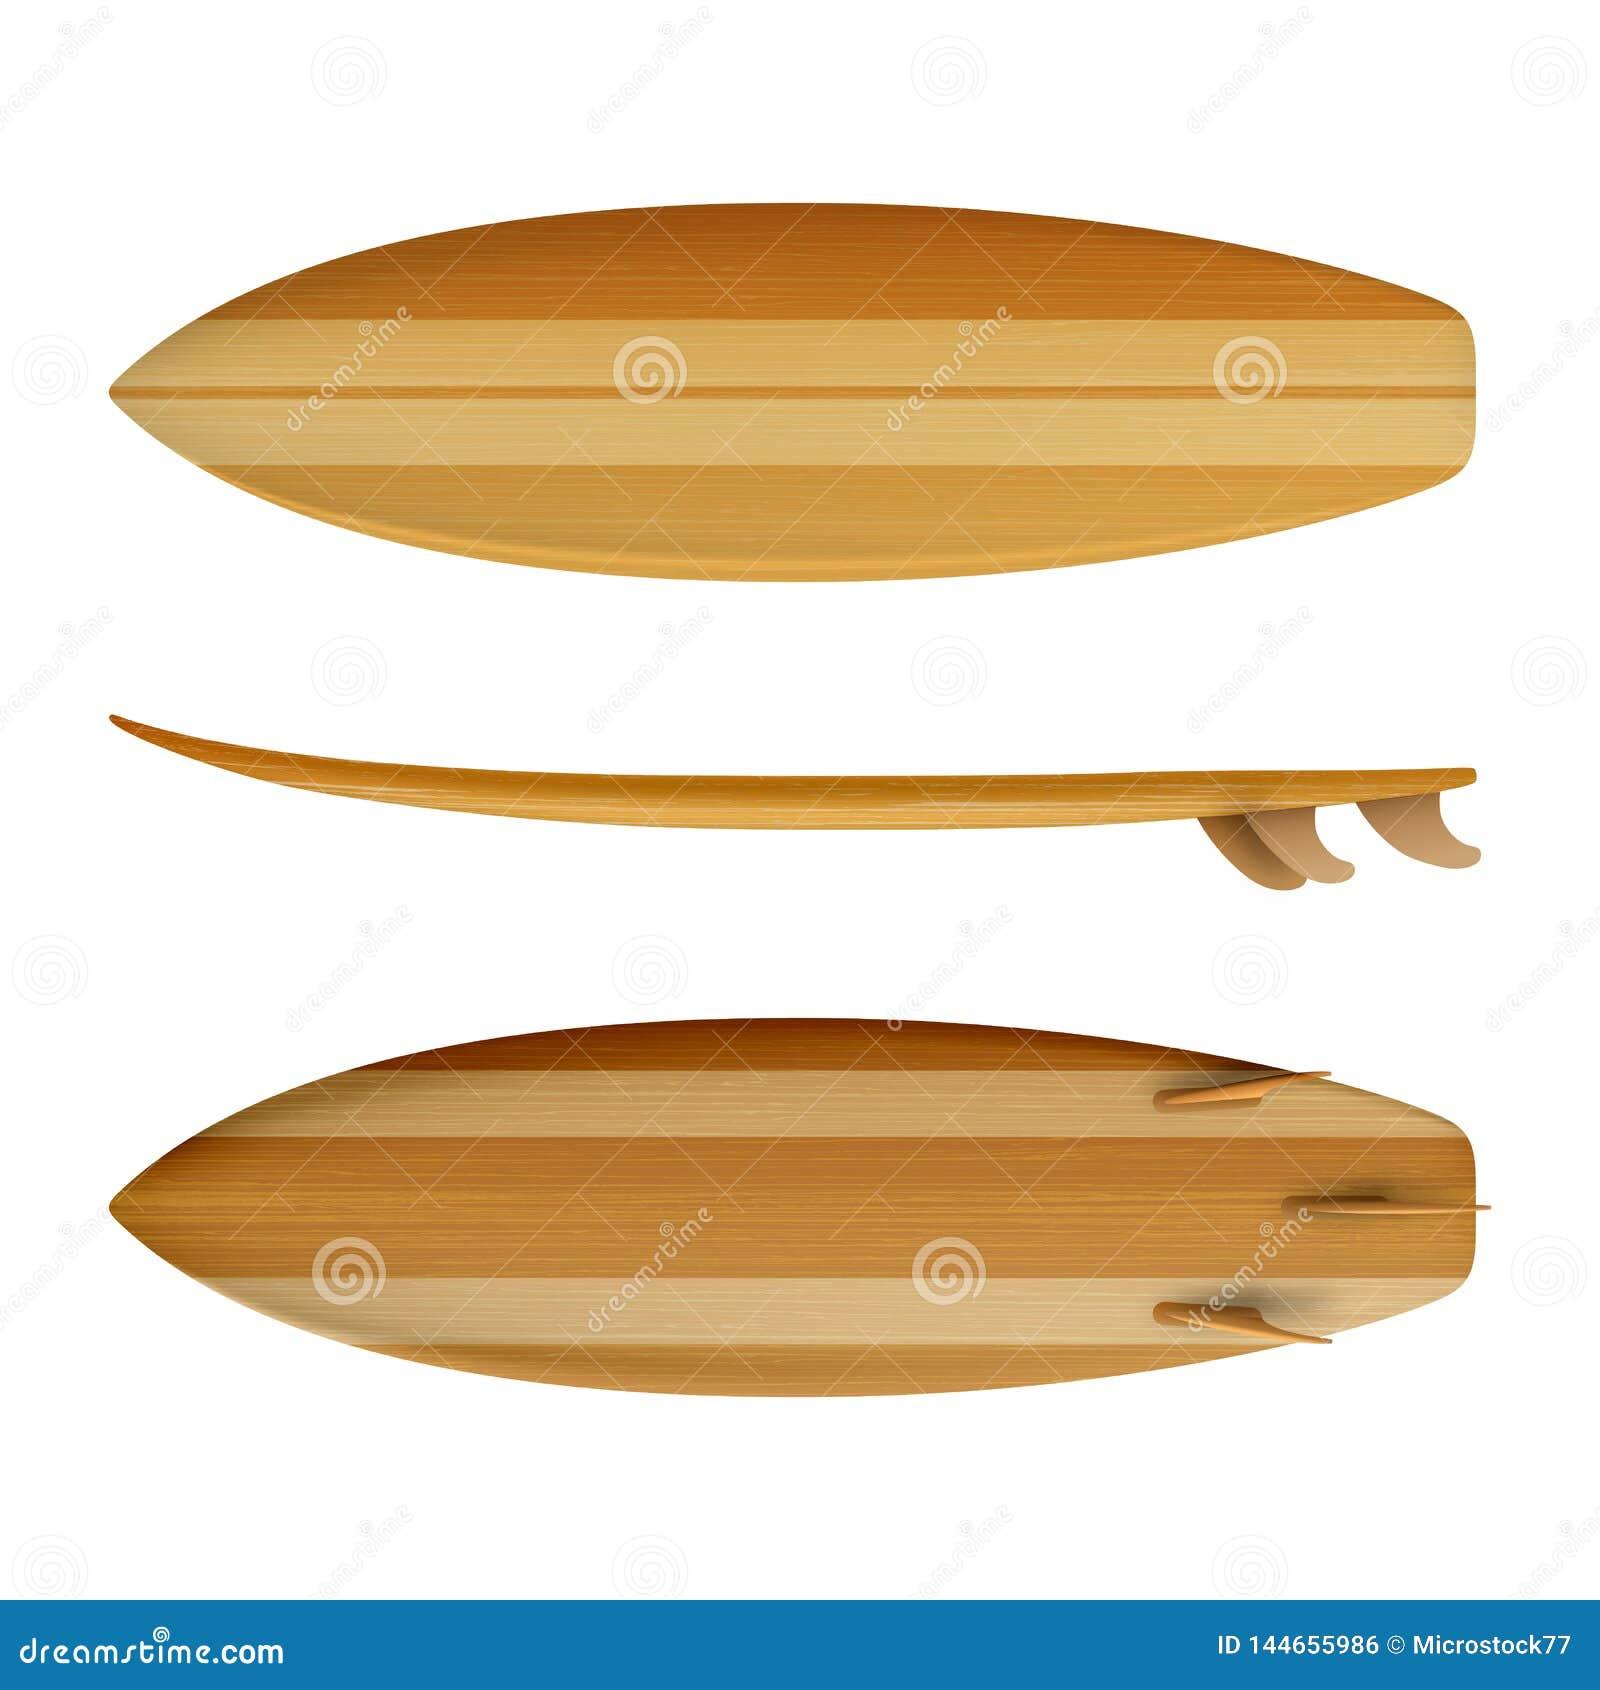 Surfboard wood isolated realistic Vector